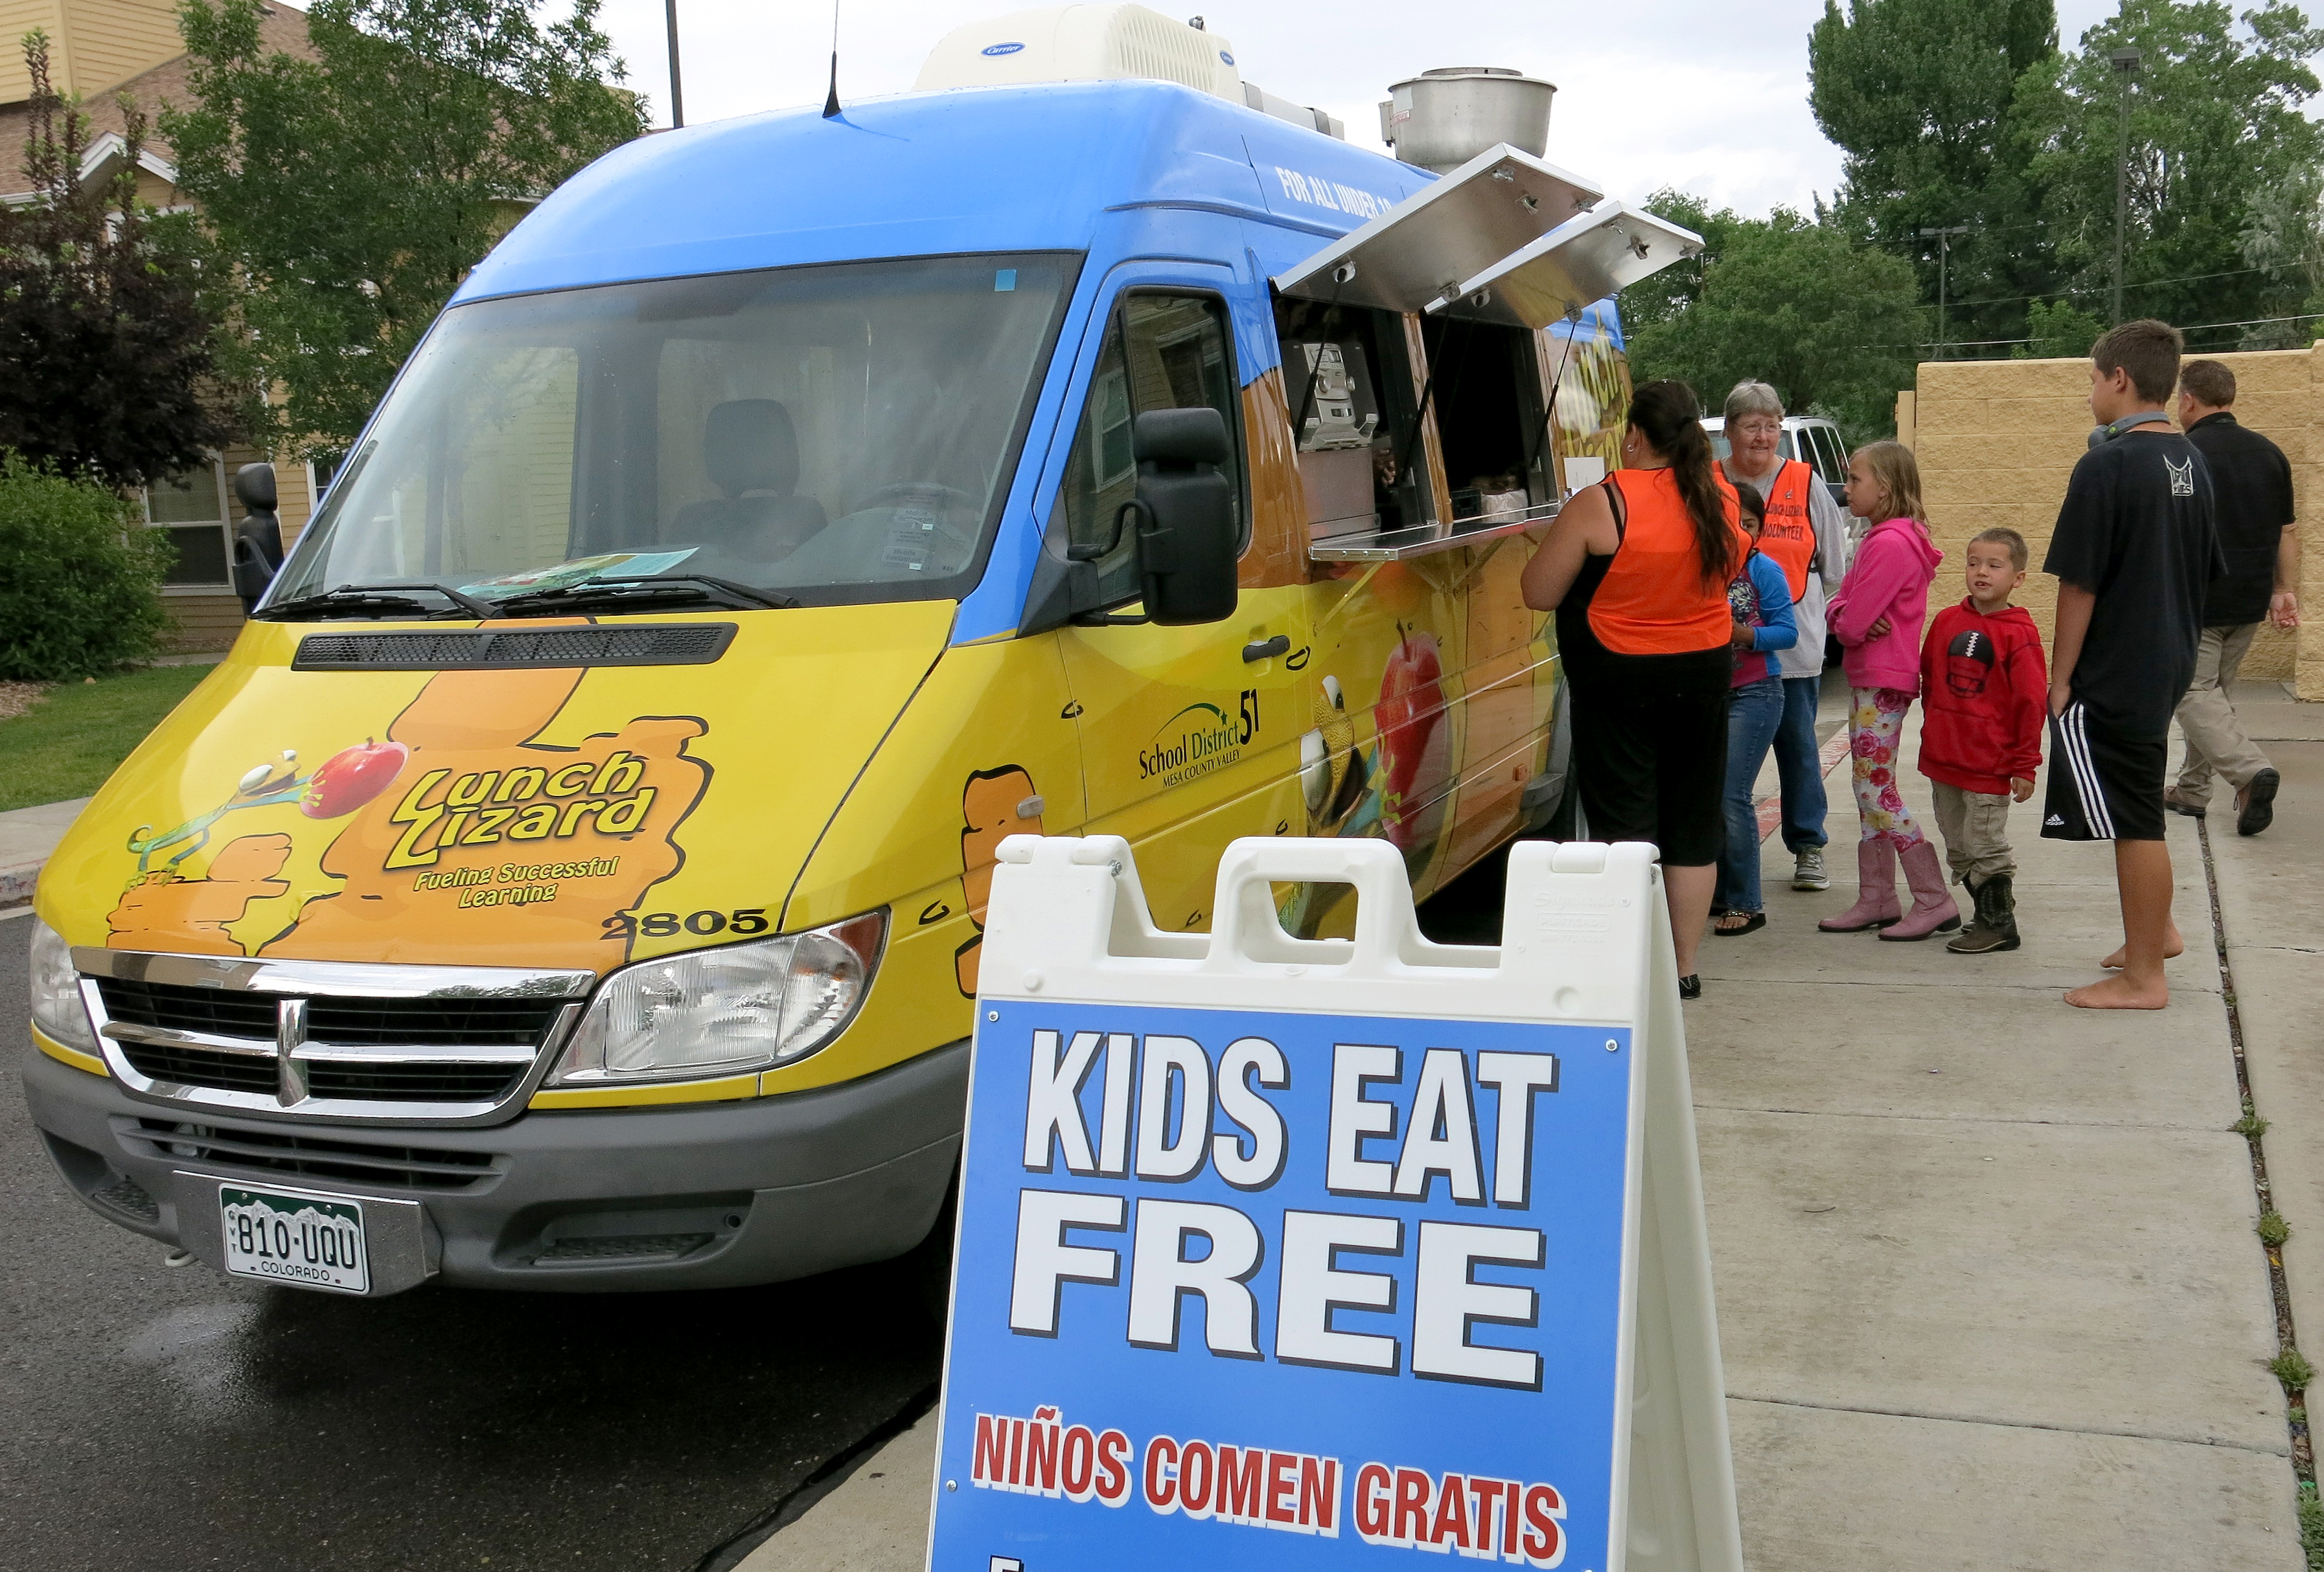 Lizard Lunch Truck Food Truck (STAFF)